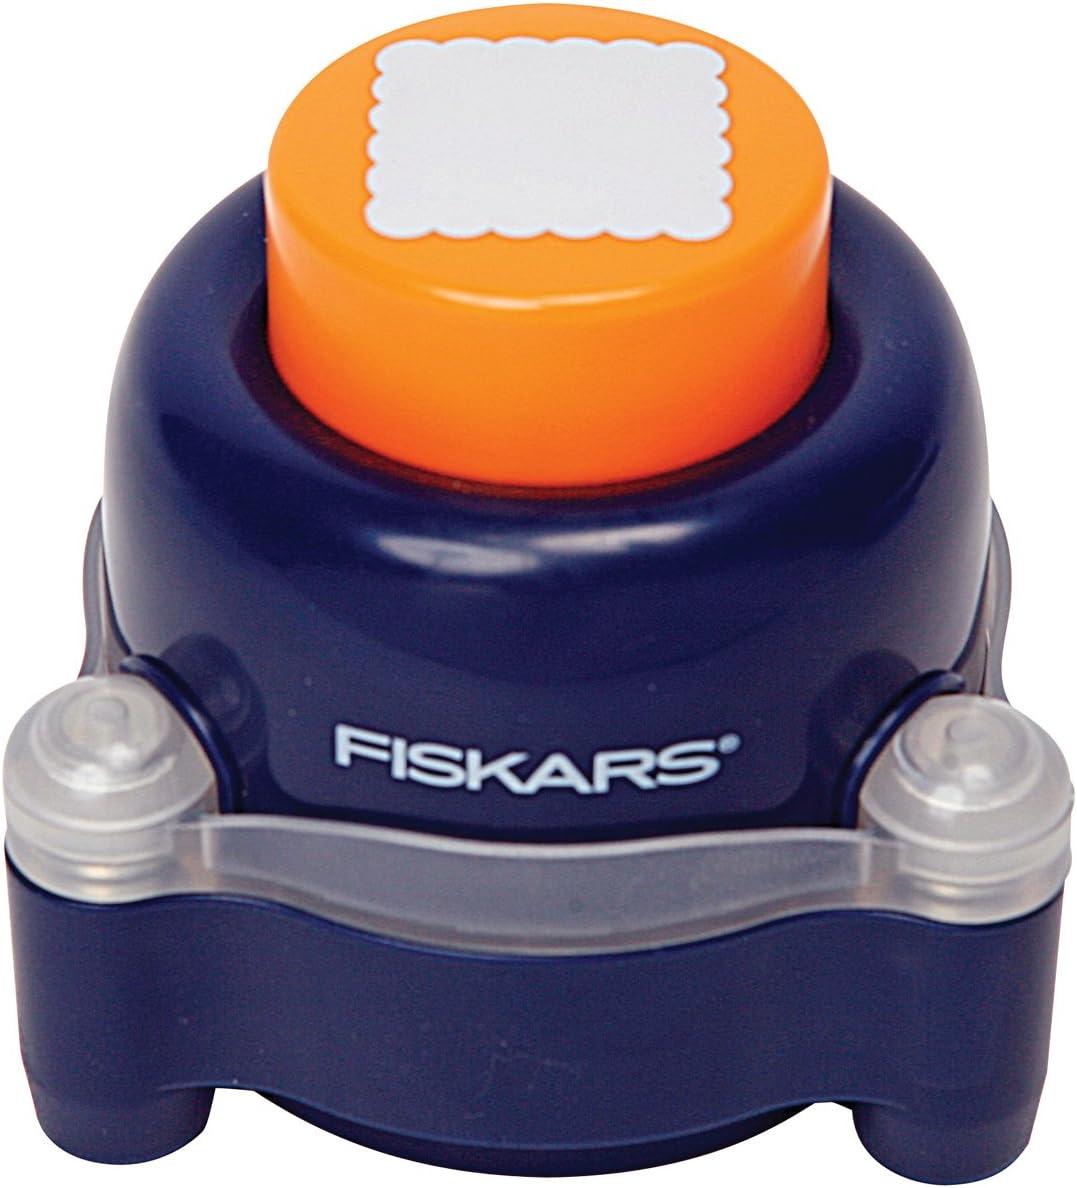 Fiskars Everywhere Punch, Refill Scalloped Square (01-005565)